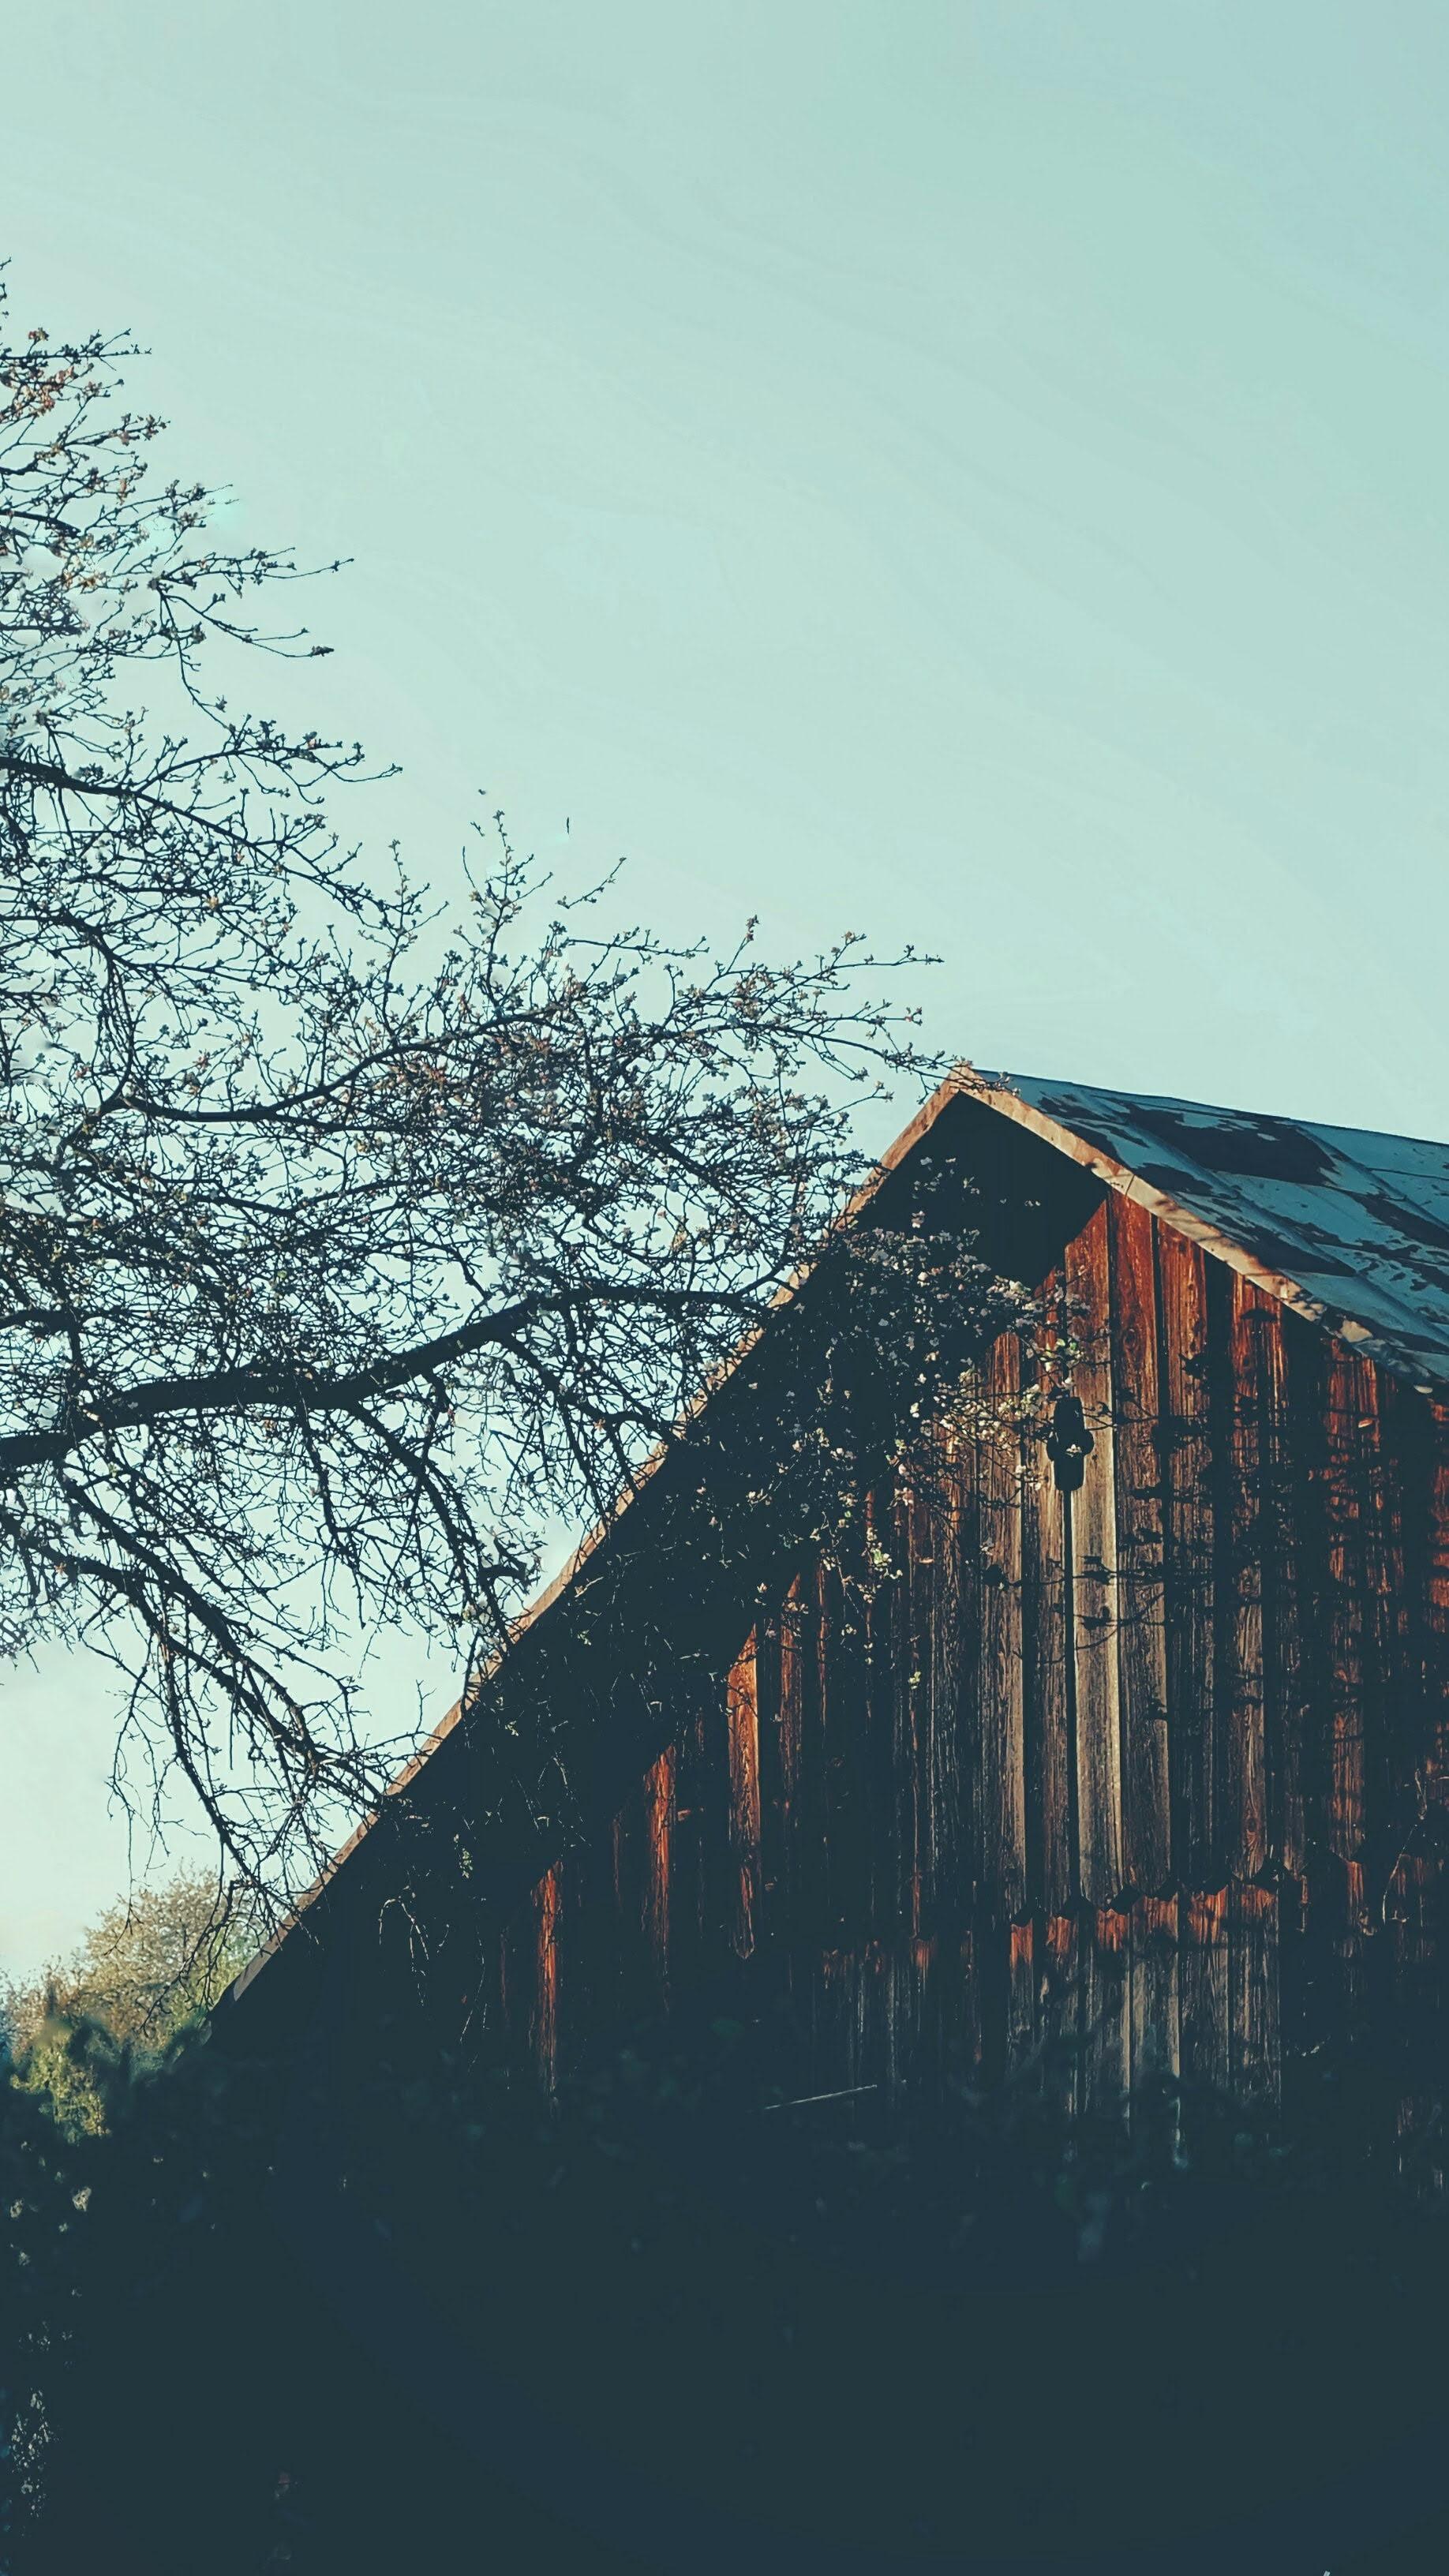 Brown Wooden House Near Bare Tree During Daytime | Photo by Oleksandra Bardash via Unsplash